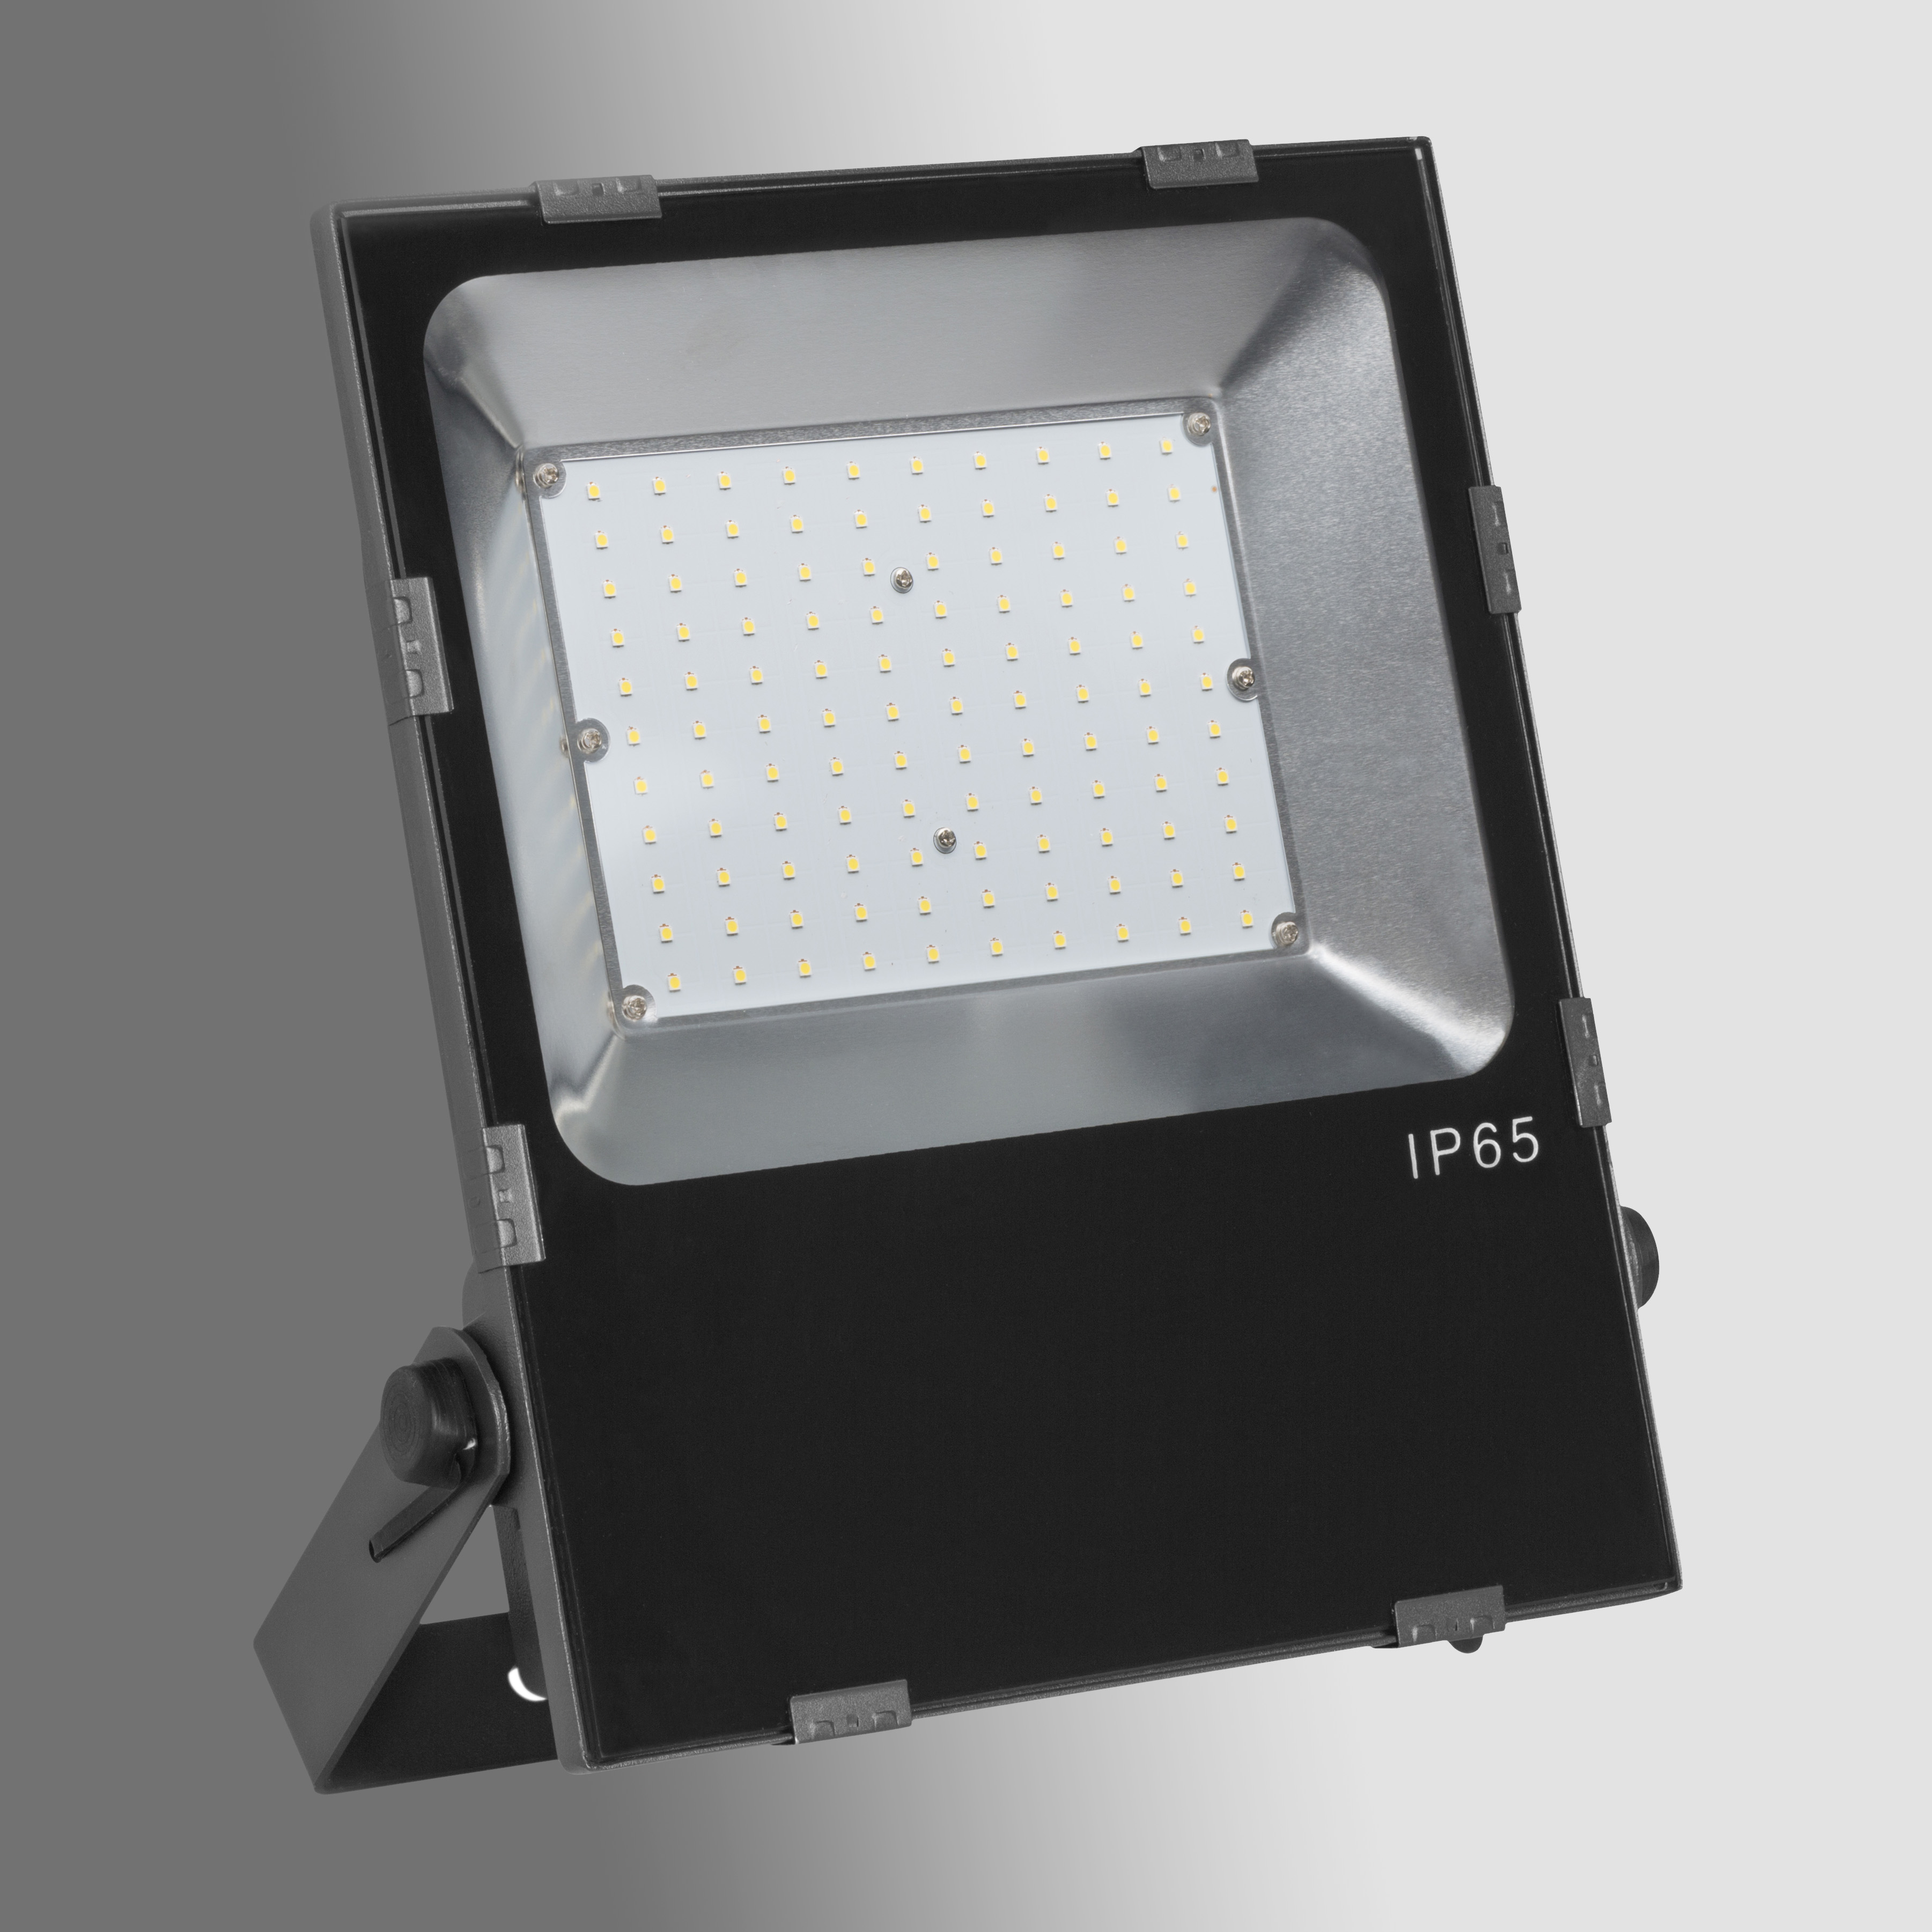 1 Stk CAPRI LED SYM 50W 5000K, 6600lm, Ra>70, IP65, EVG, schwarz LI99001717